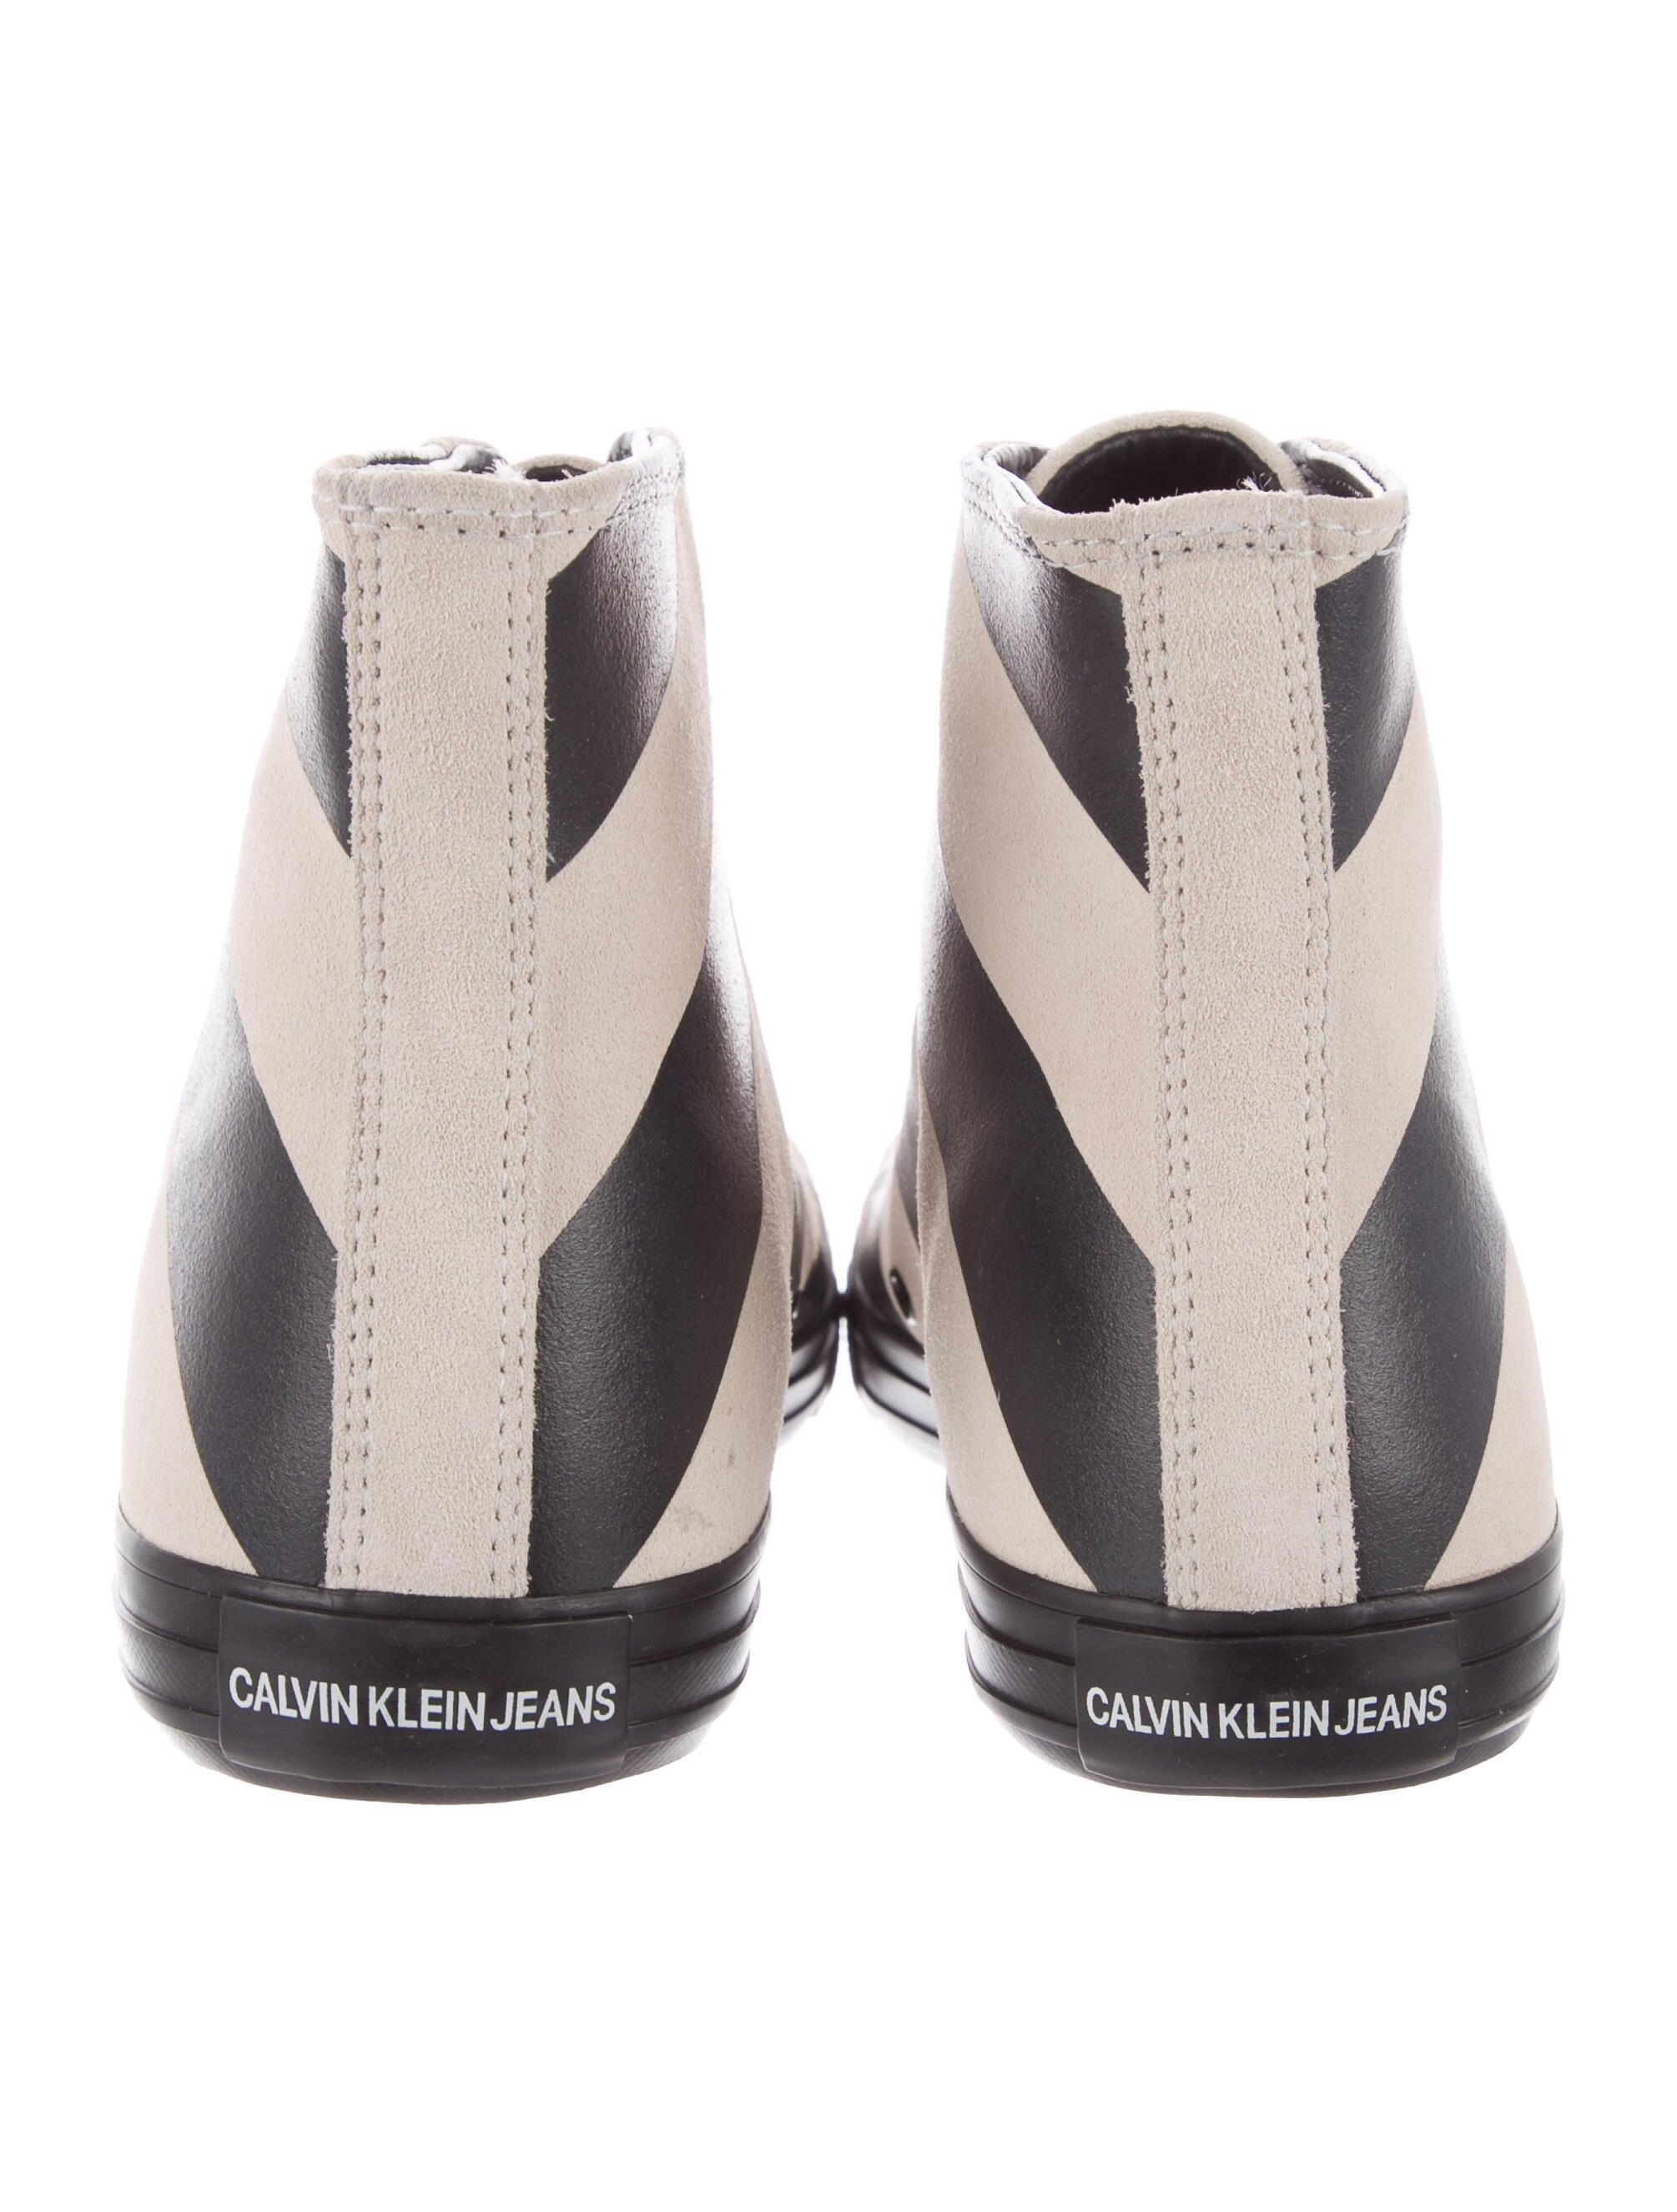 Calvin Klein 205W39NYC Striped Leather